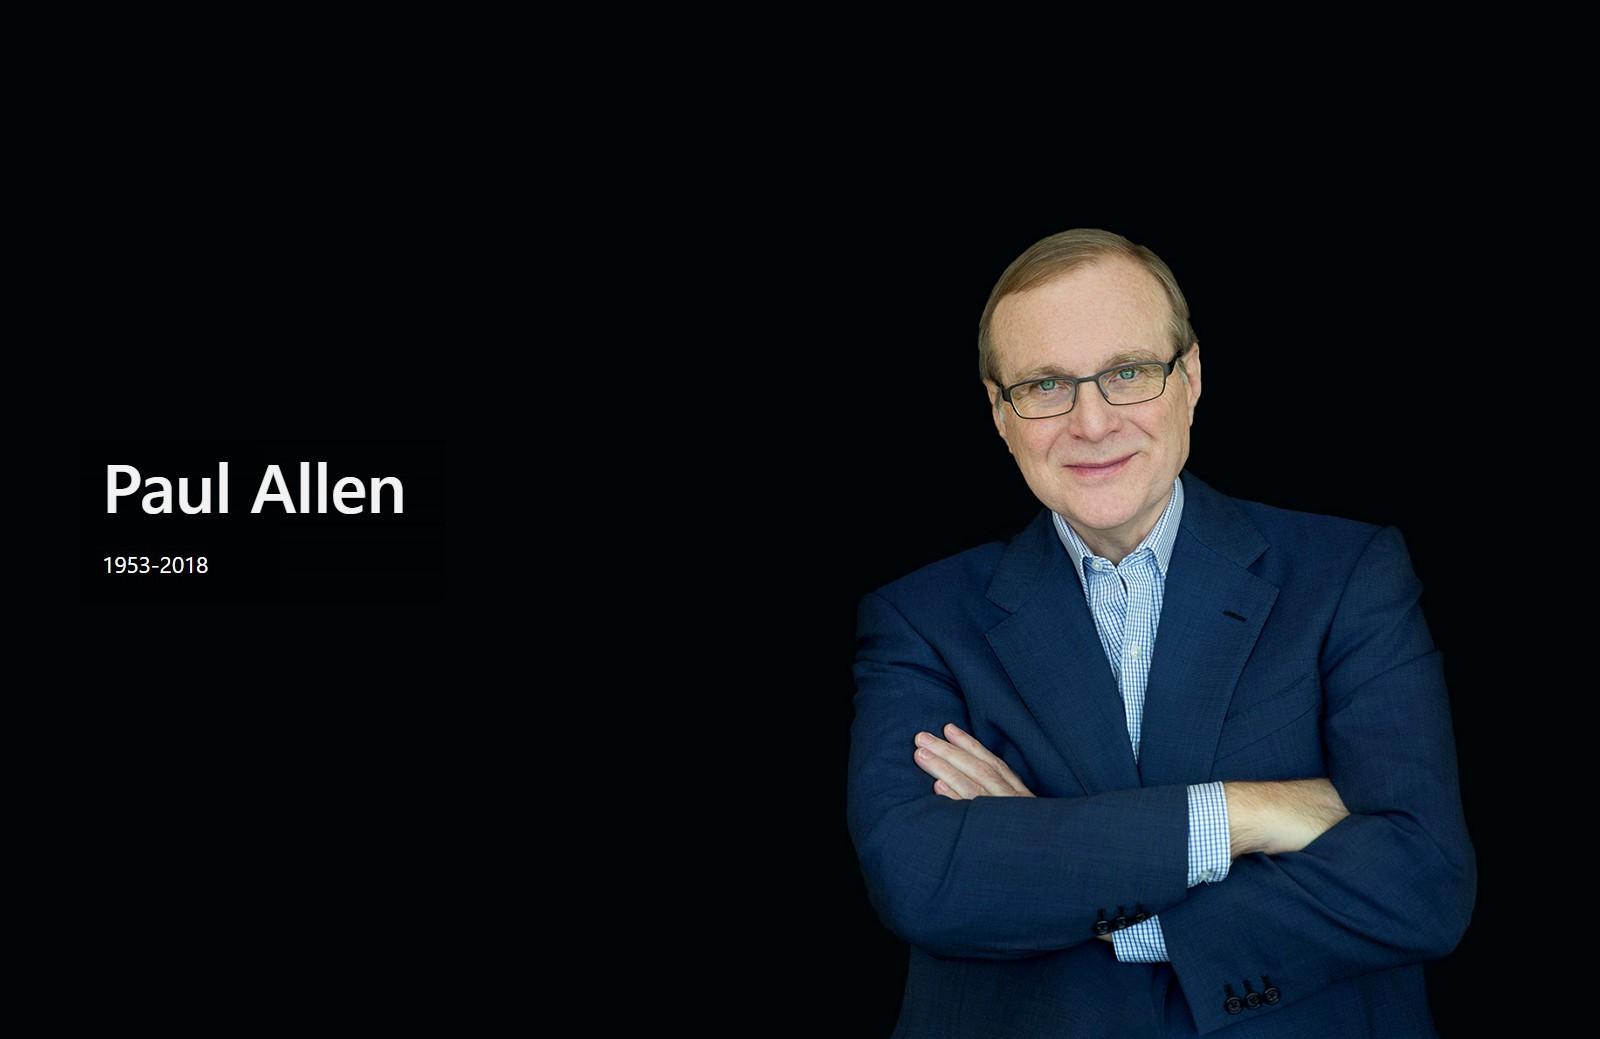 Paul Allen, Microsoft co-founder